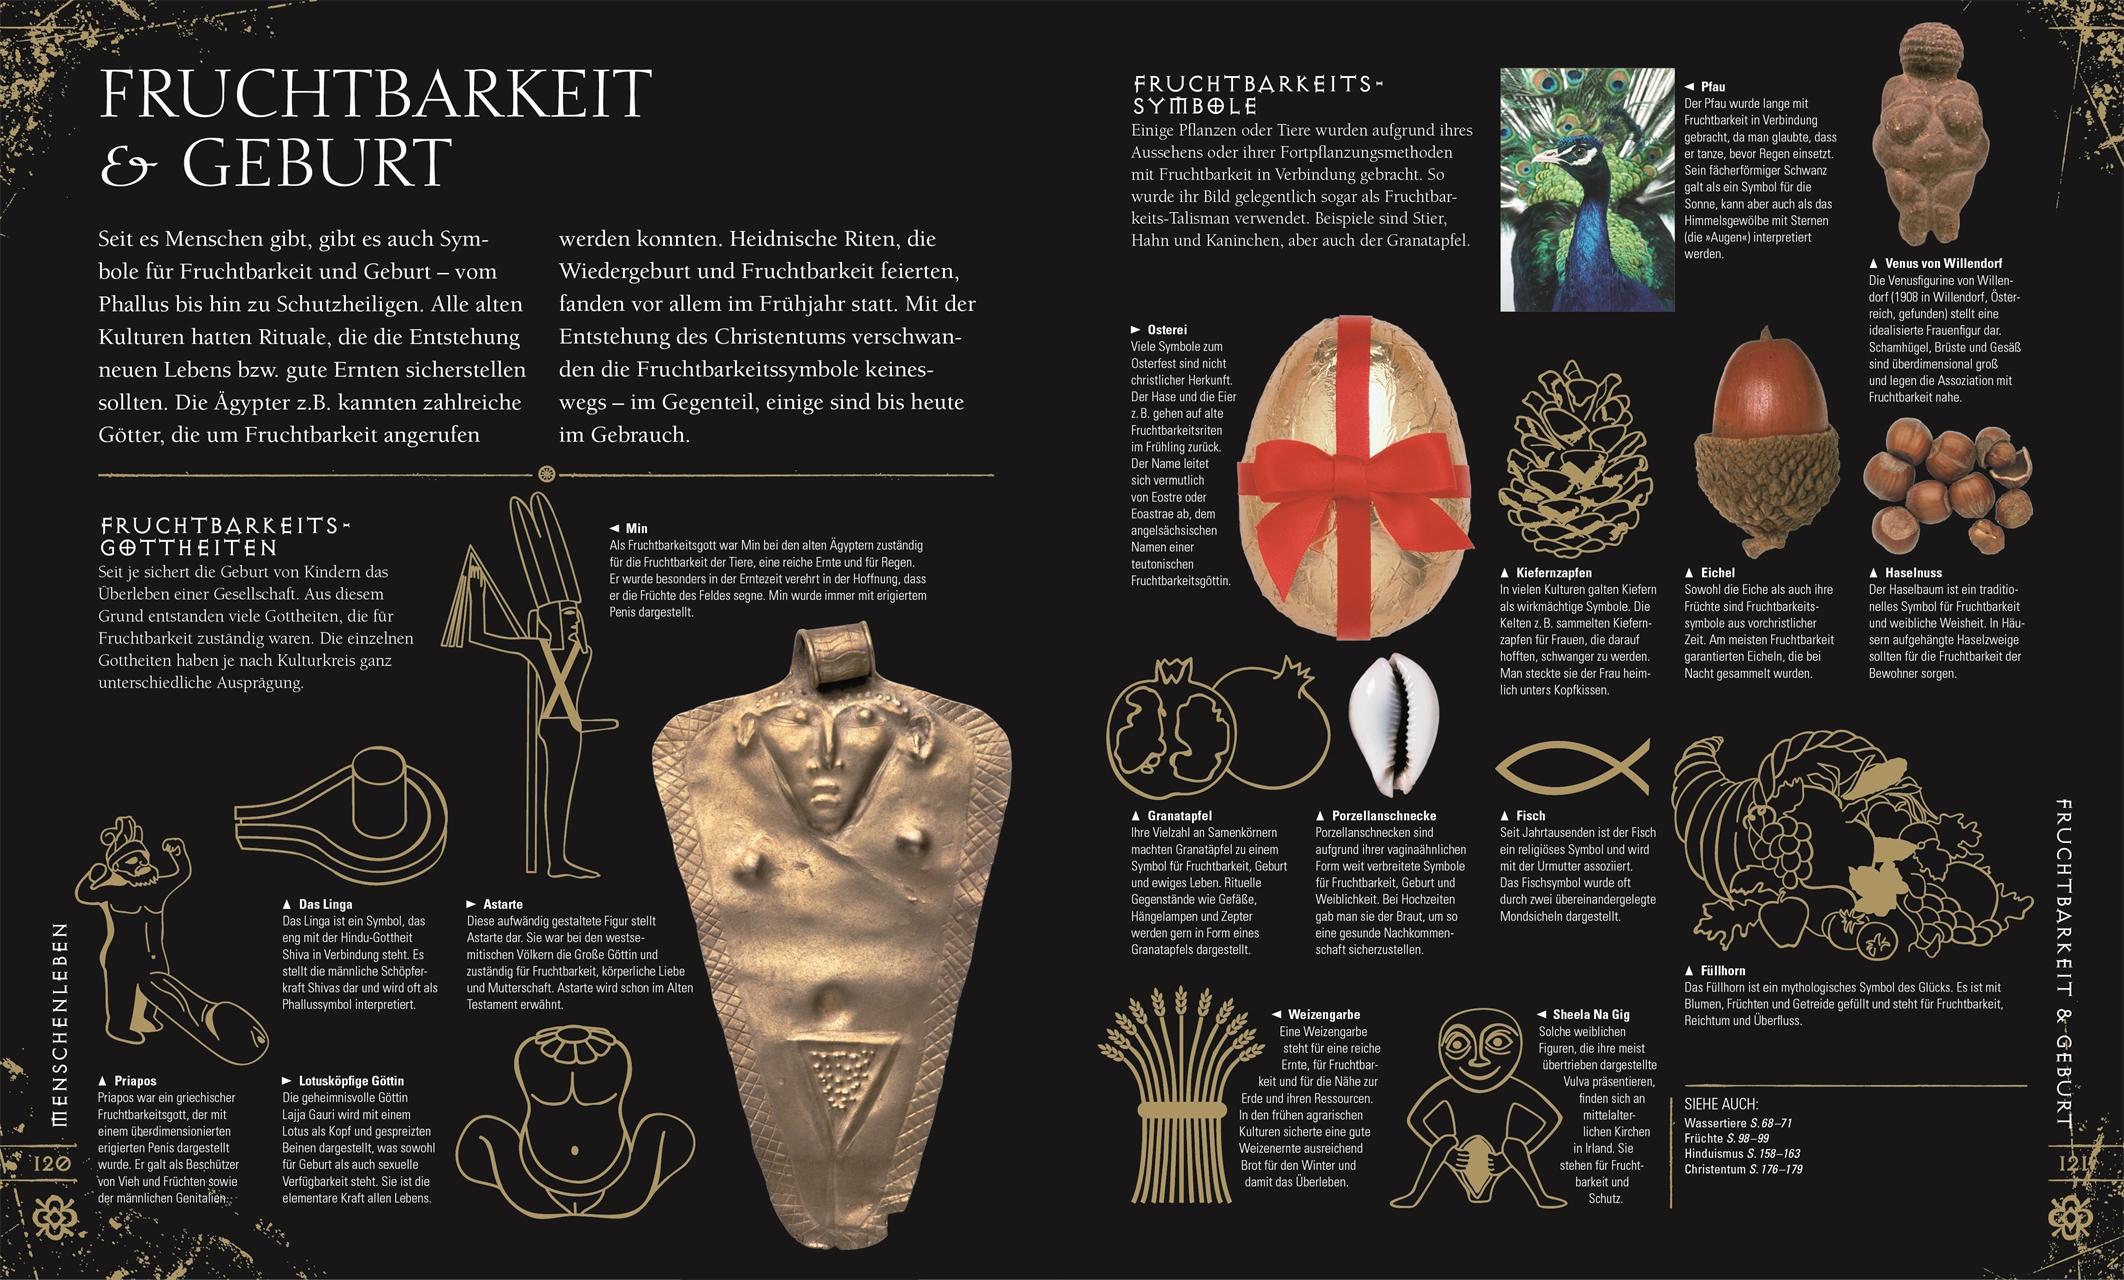 Liste symbole bedeutung Wappen, Bedeutung